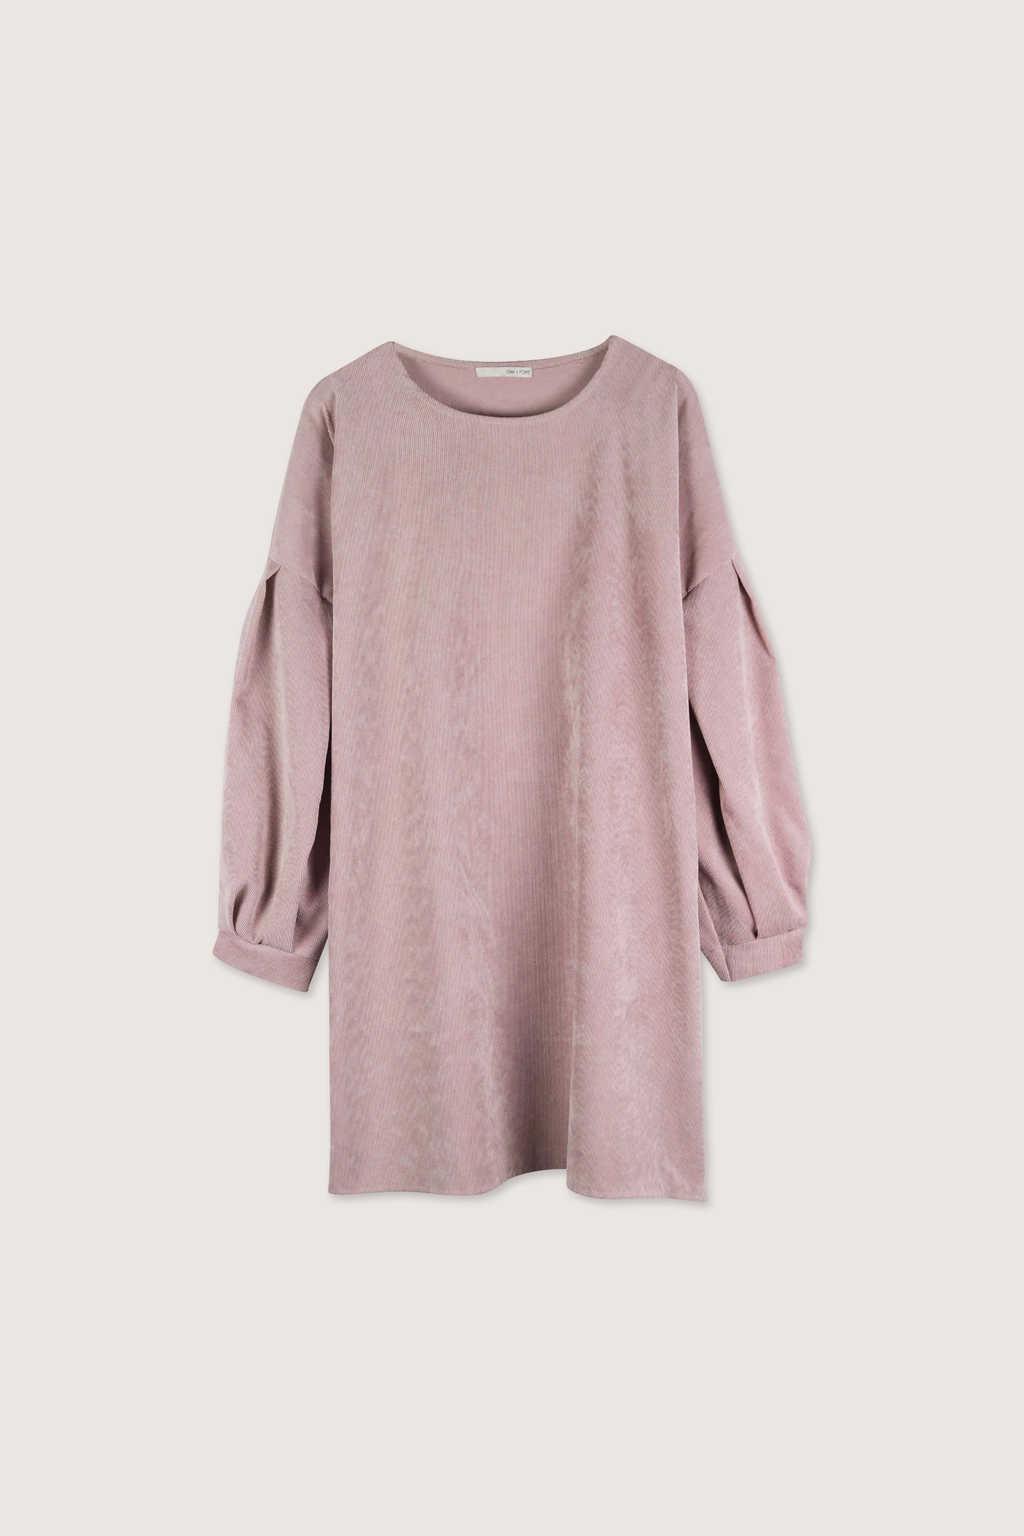 Tunic H033 Pink 5